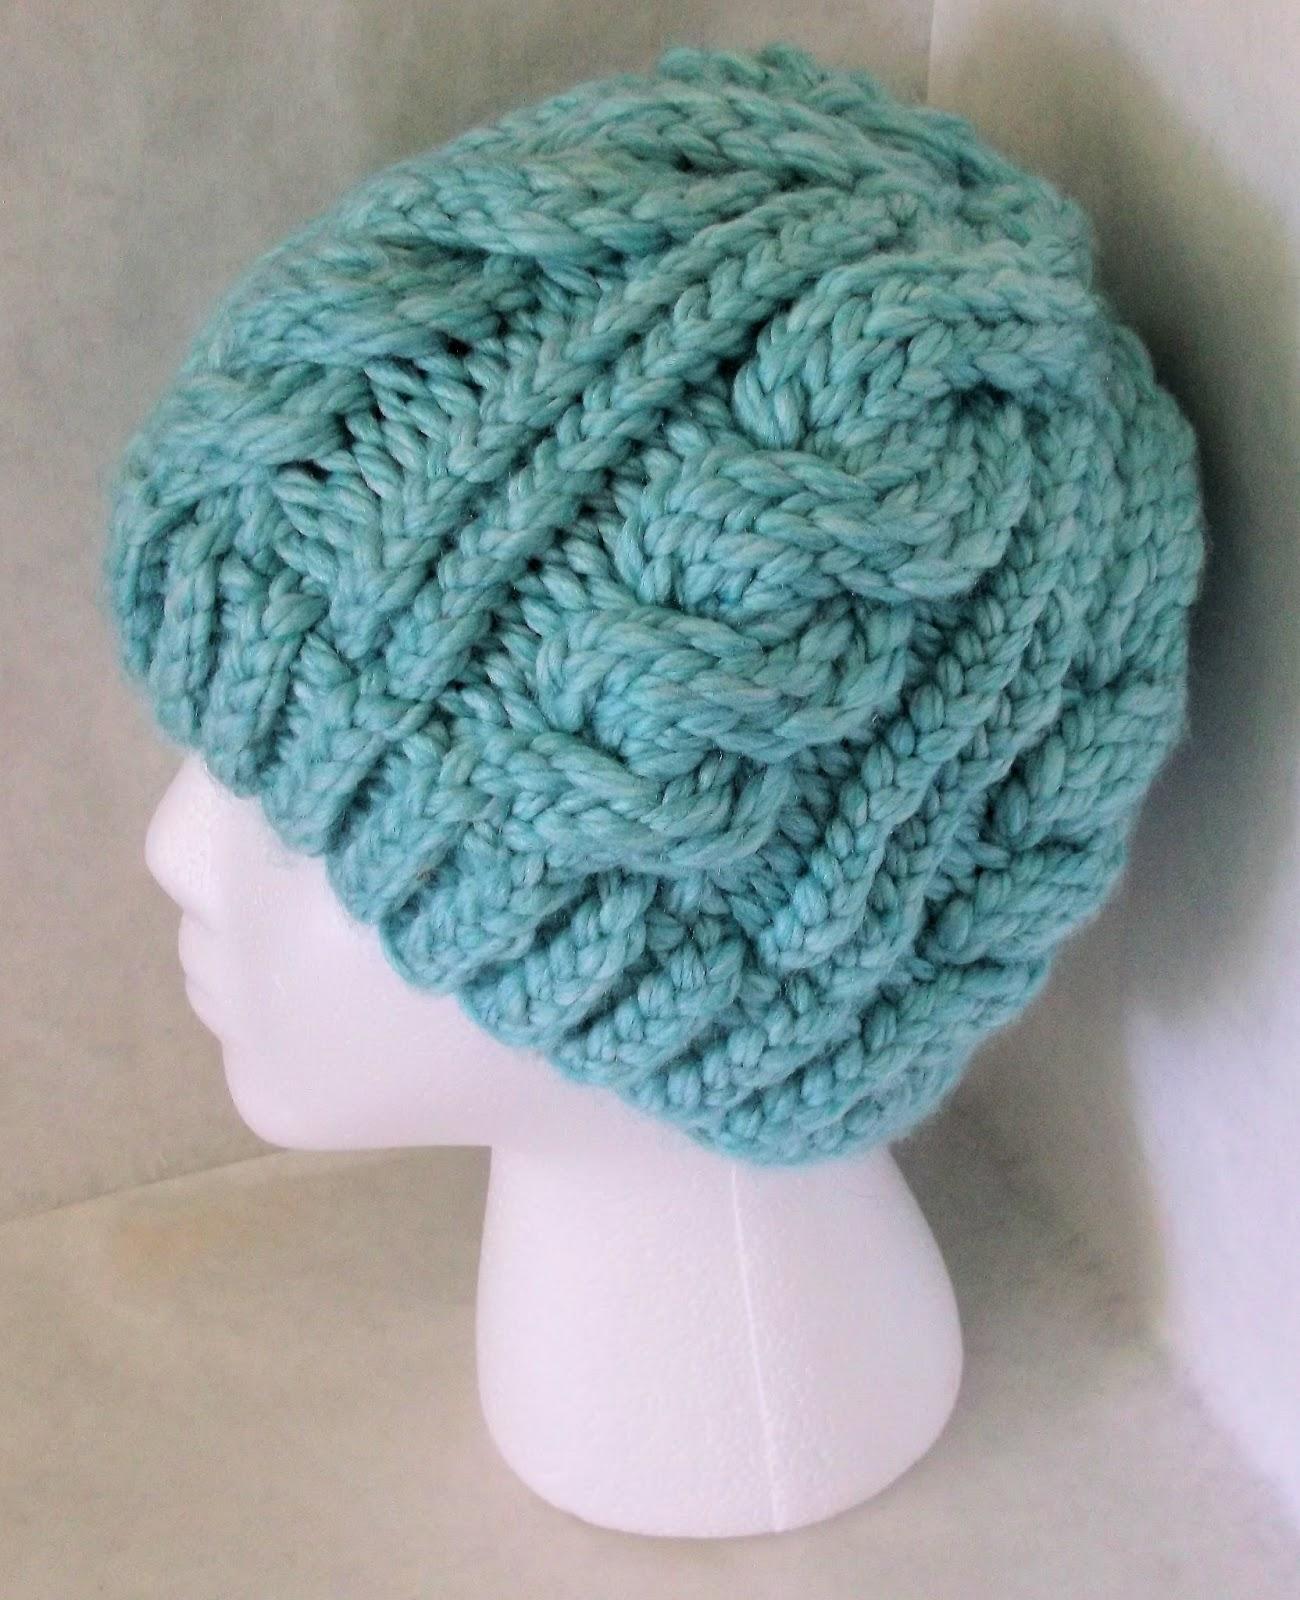 Loom Knitting Hat Patterns For Beginners : Premium knitting looms by cindwood crafts loom yarn